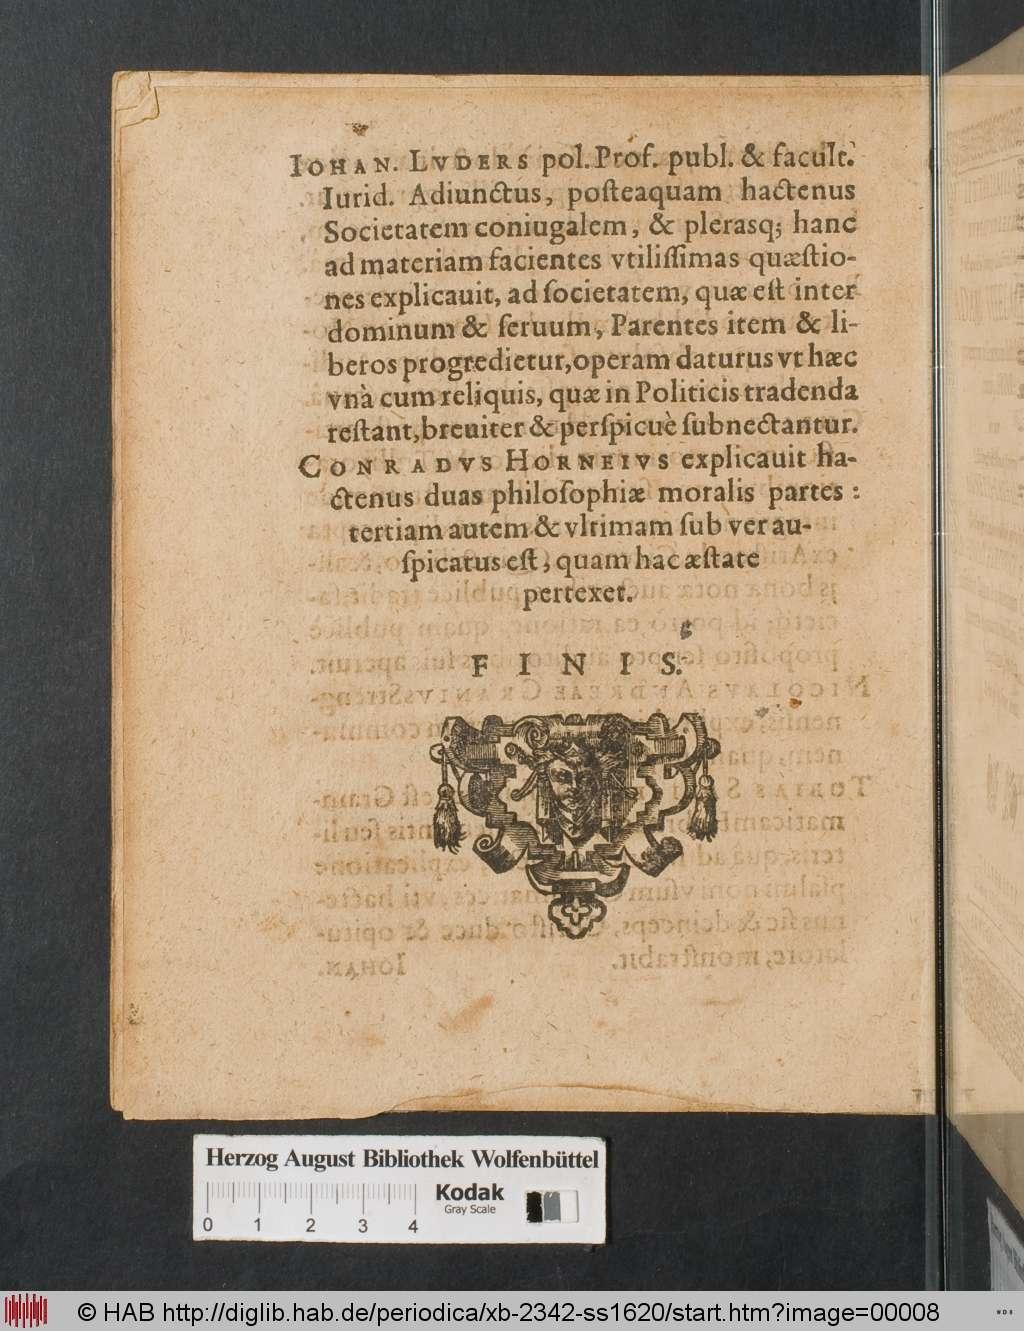 http://diglib.hab.de/periodica/xb-2342-ss1620/00008.jpg